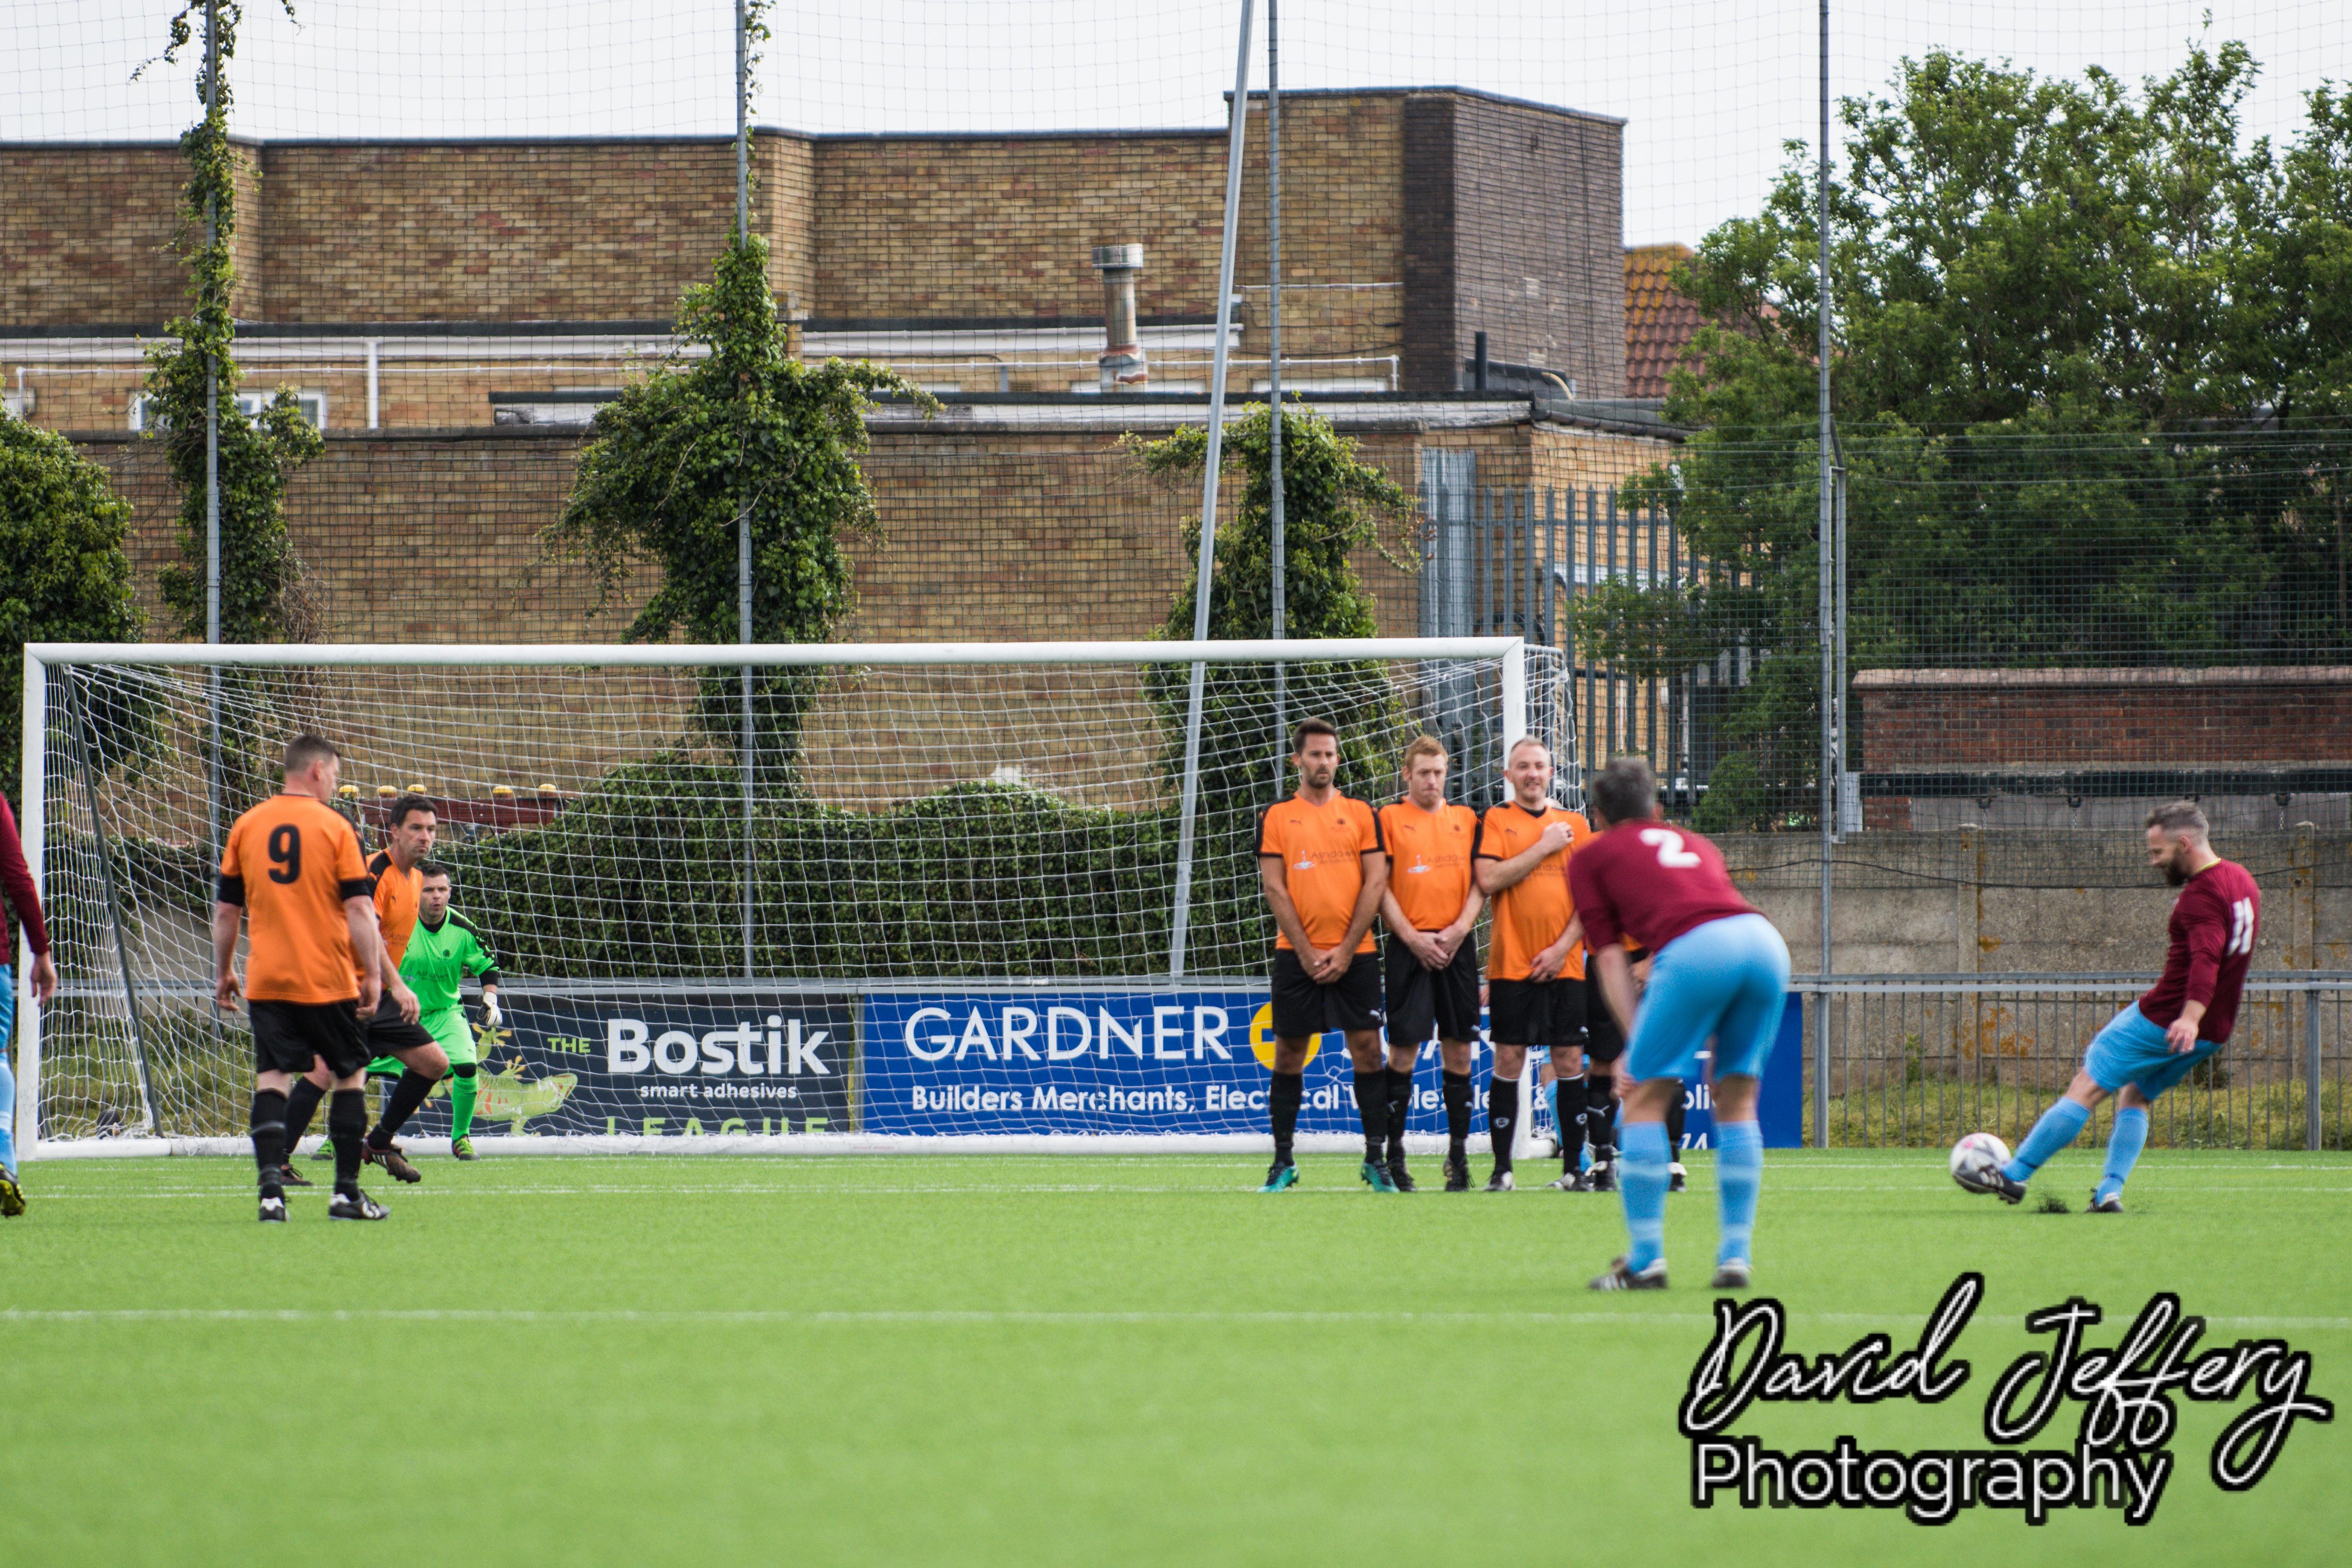 026 MOFC Vets vs Horl Vets 05.05